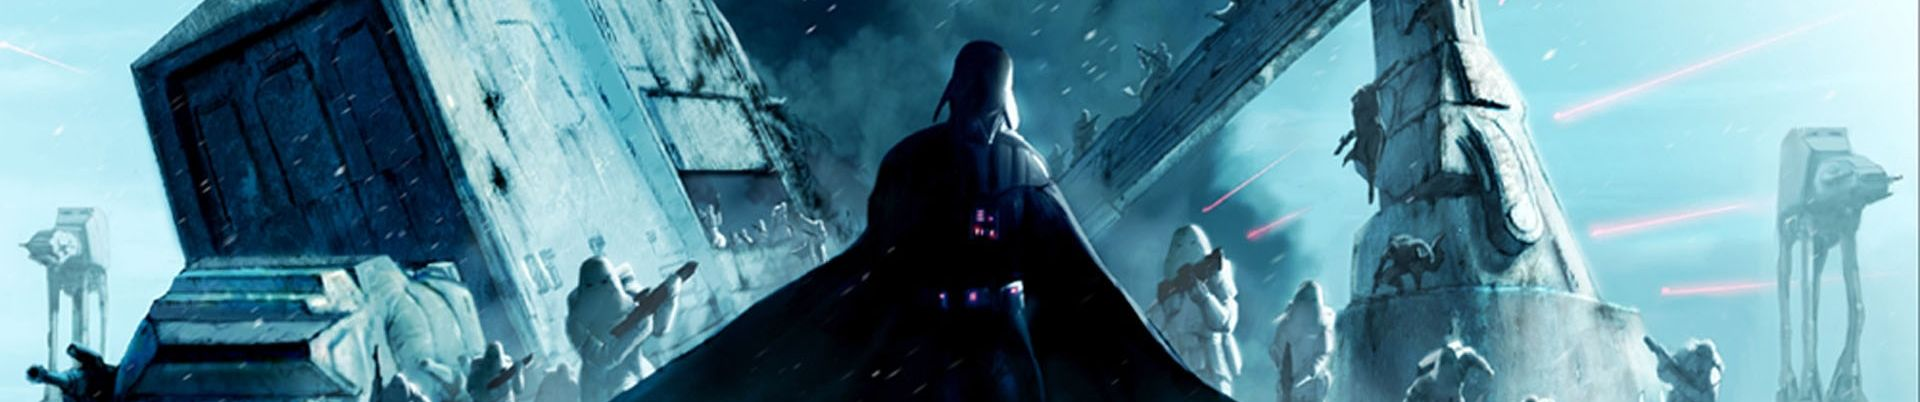 Star Wars Battlefront II: Original Soundtrack by Gordy Haab | Free